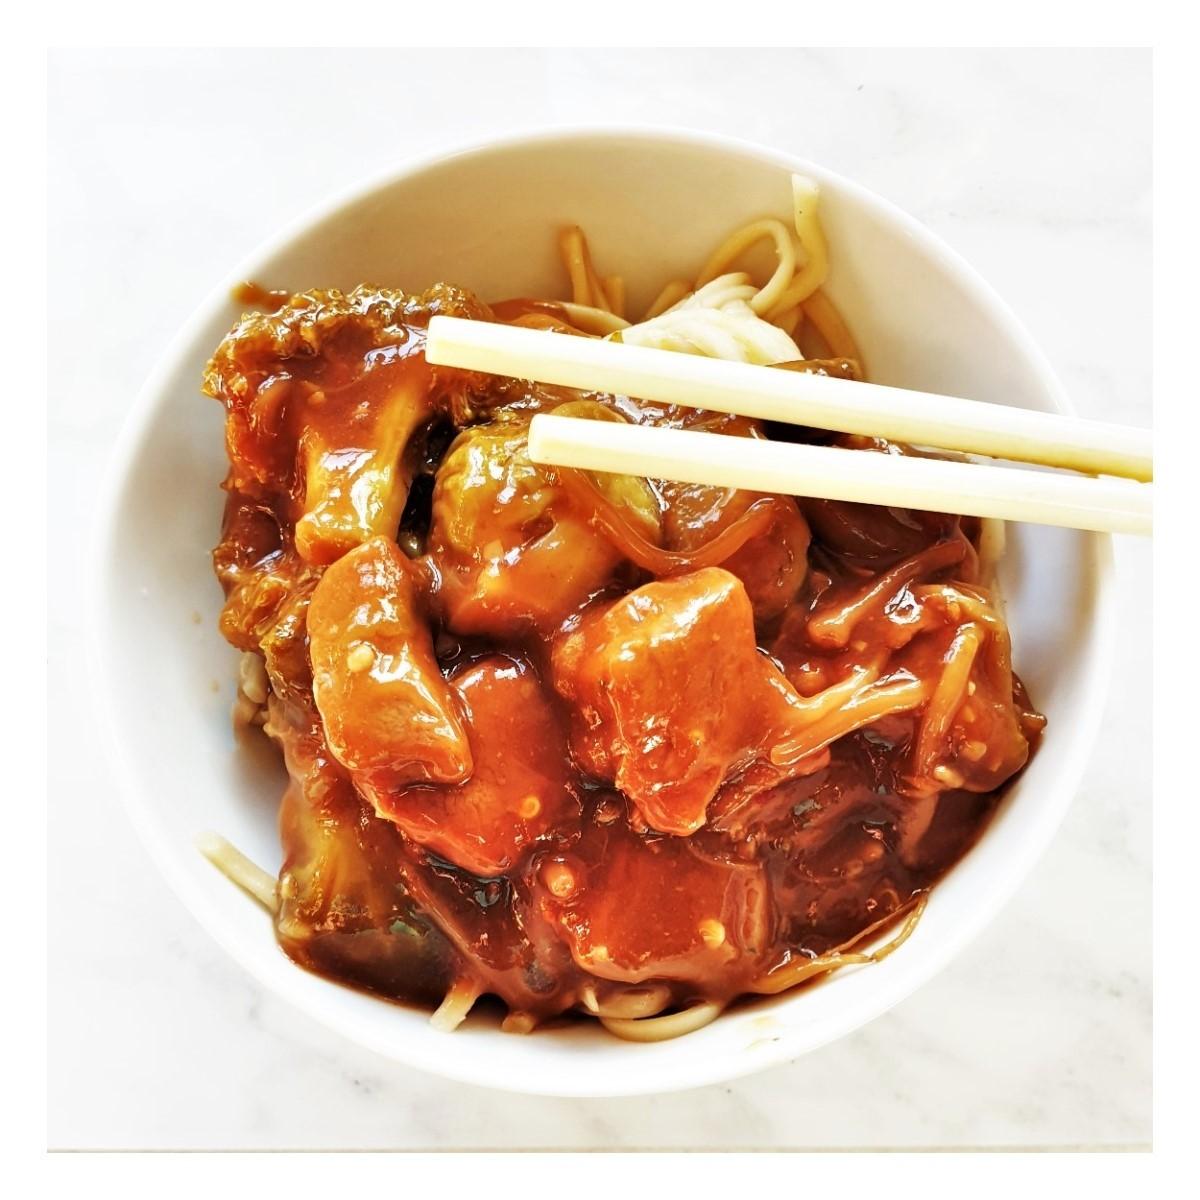 A bowl of roast pork in garlic sauce with chopsticks.